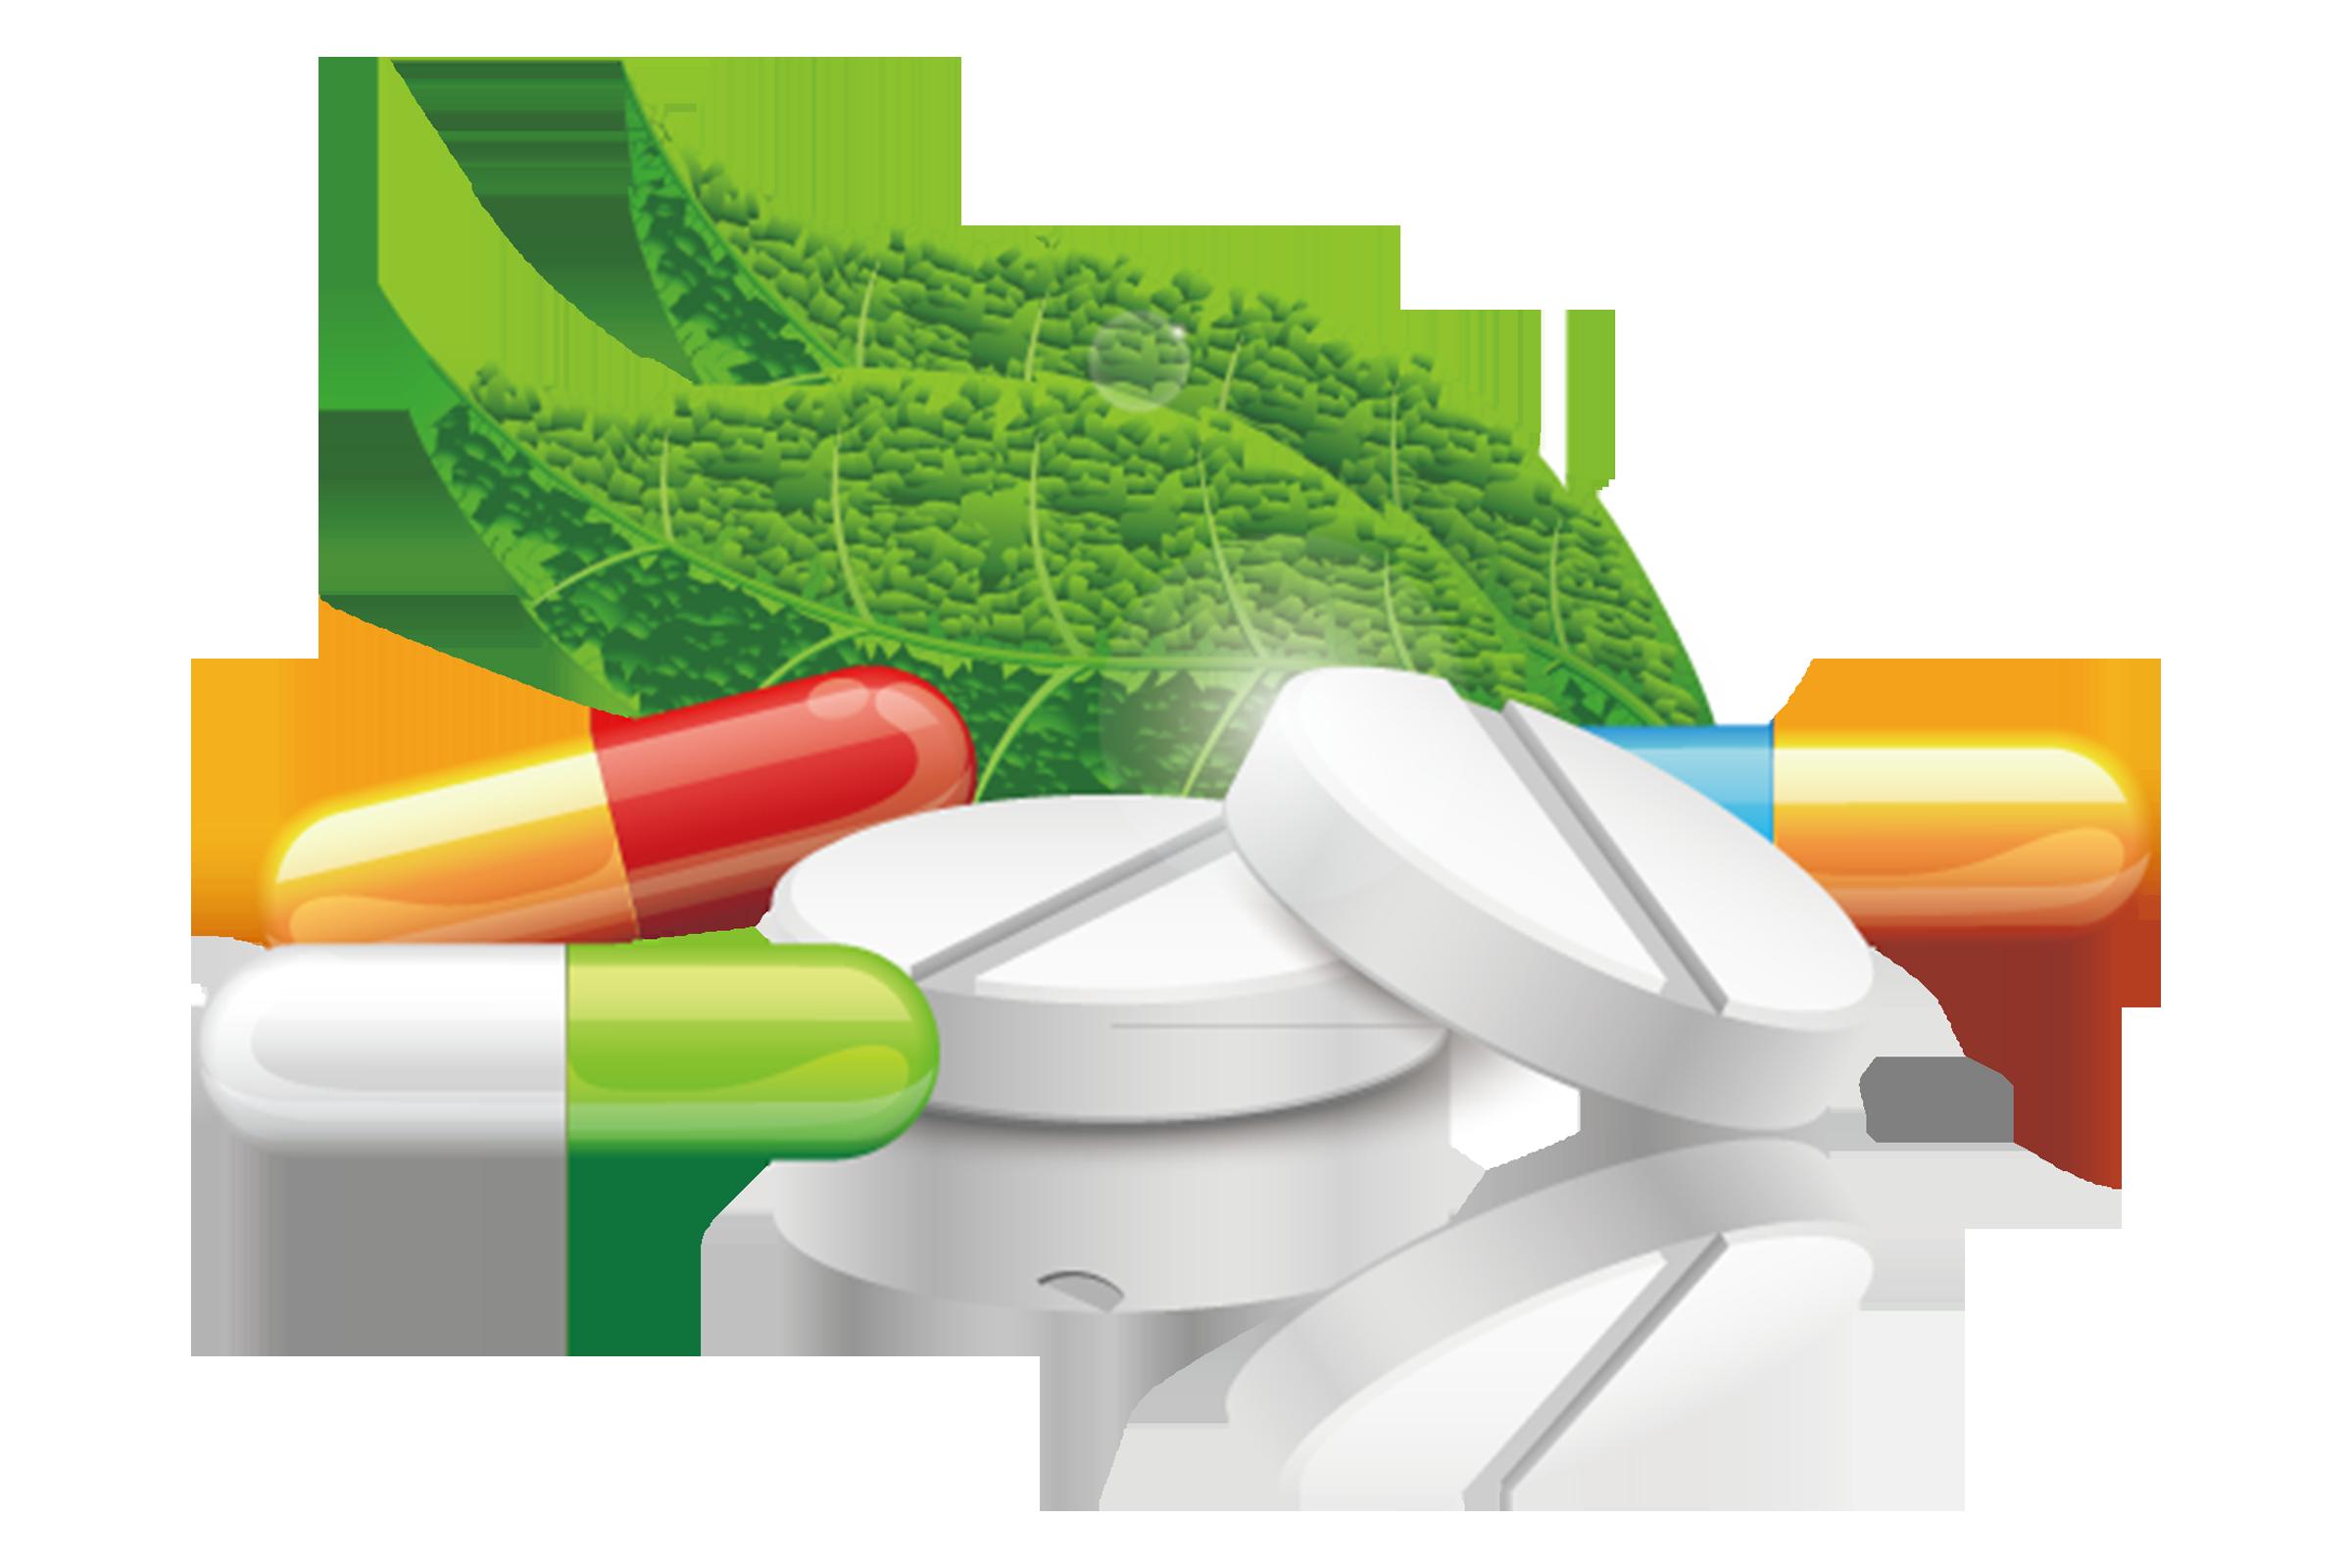 Herbalism medicine naturopathy alternative. Pills clipart pharmacist